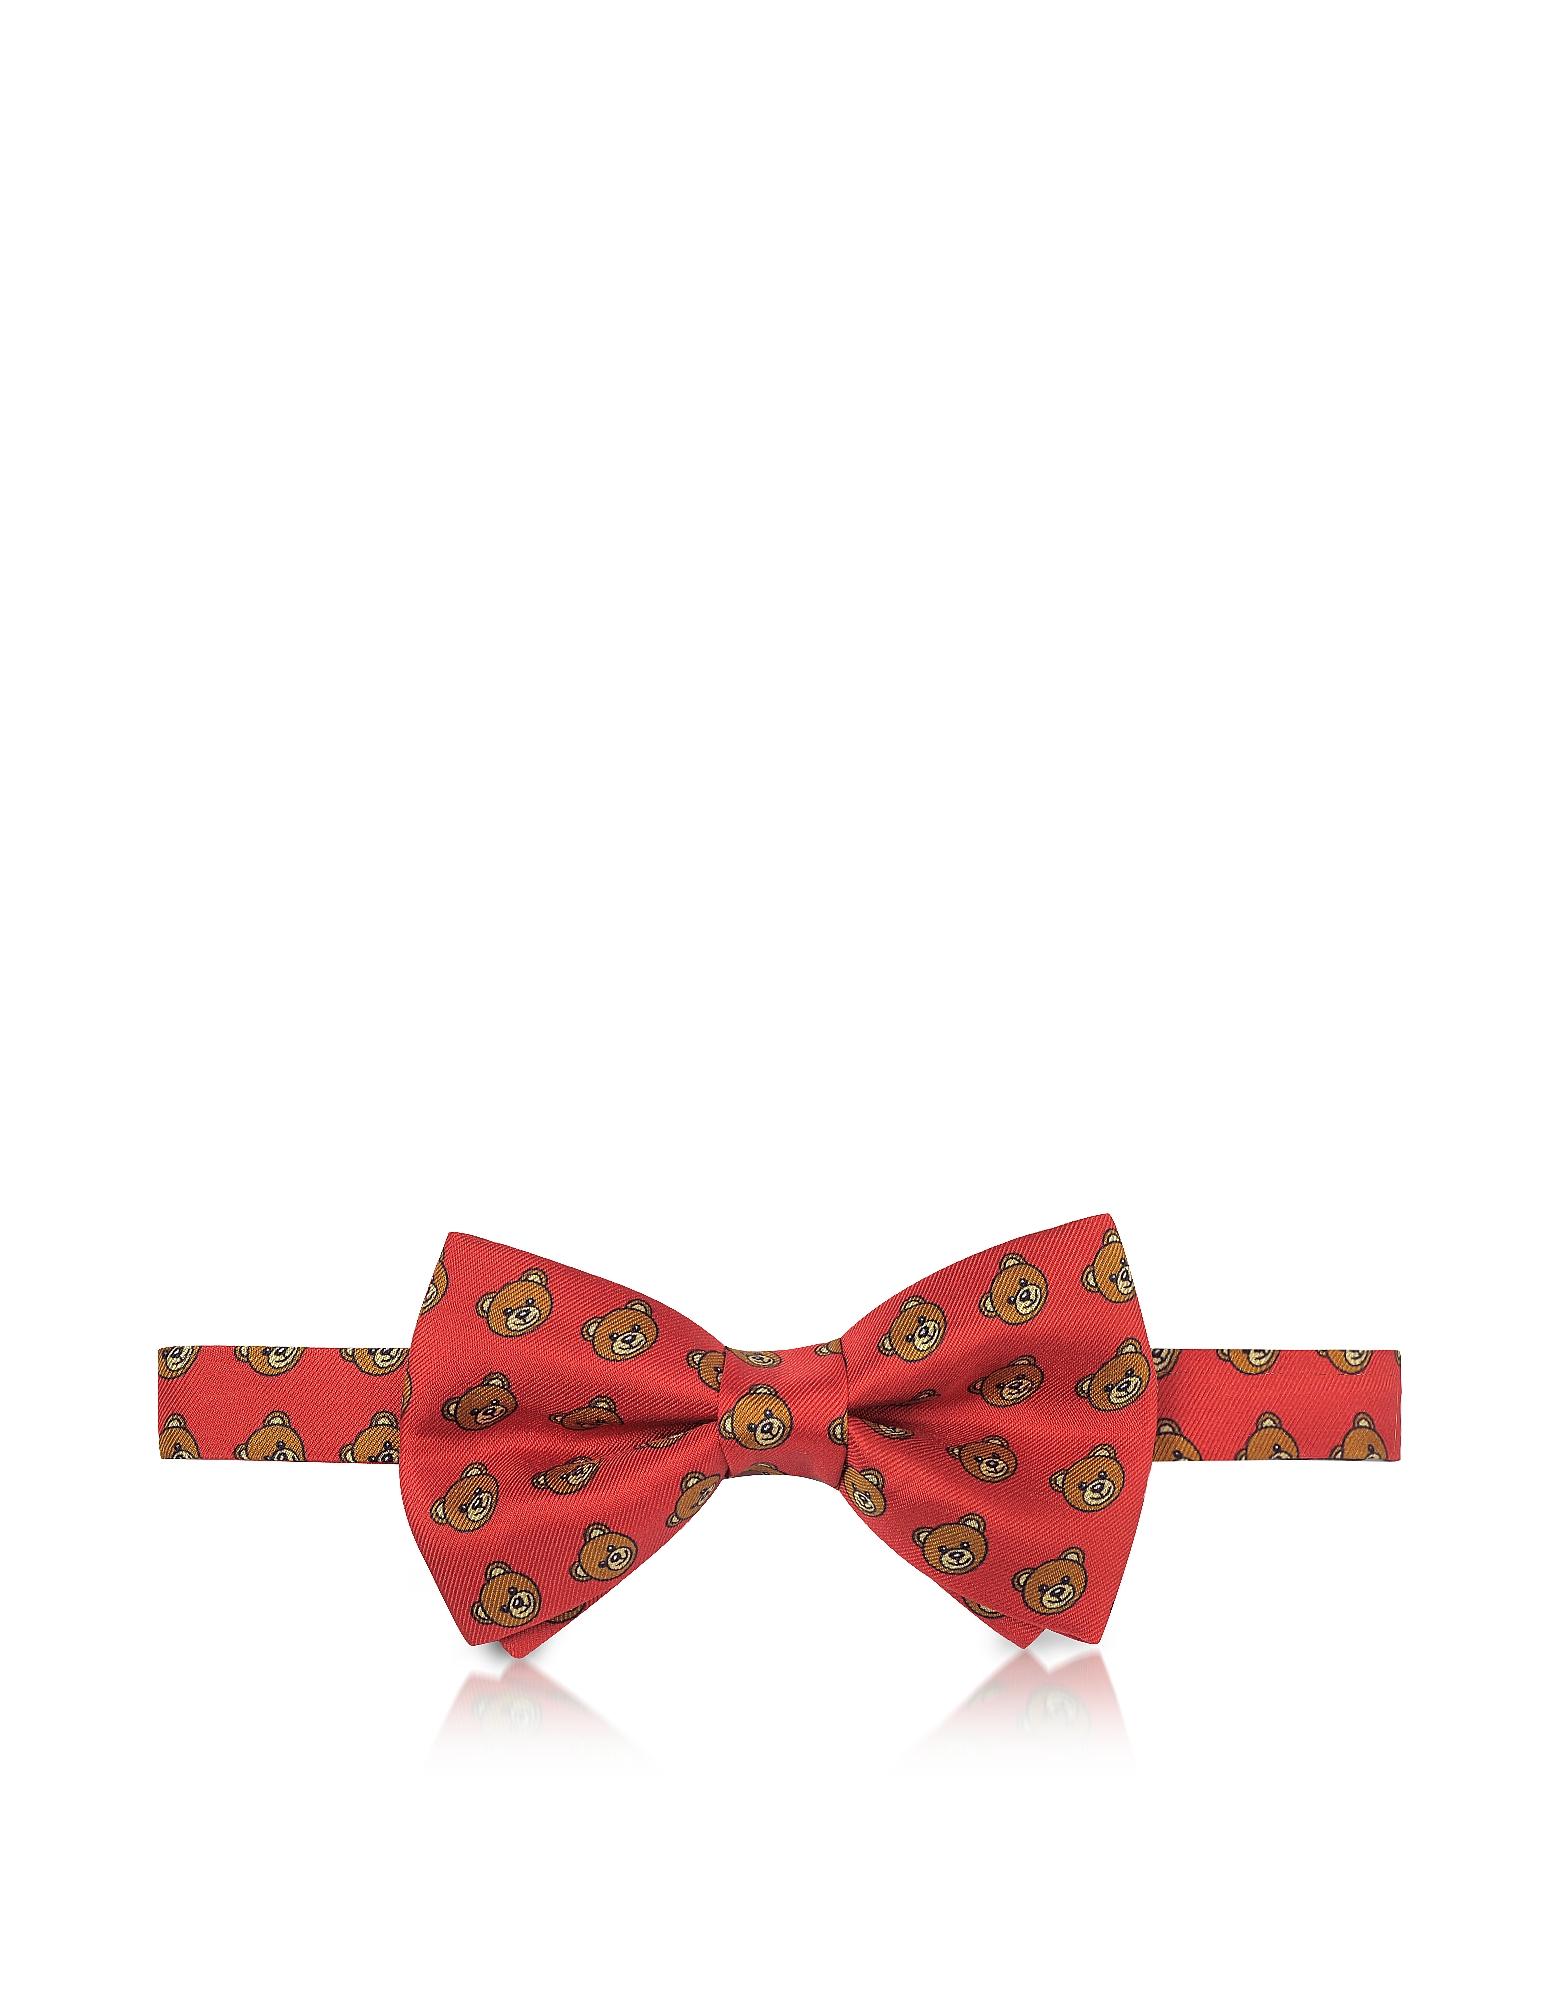 Moschino Красный Галстук Бабочка из Твилового Шелка с Принтом Медвежат